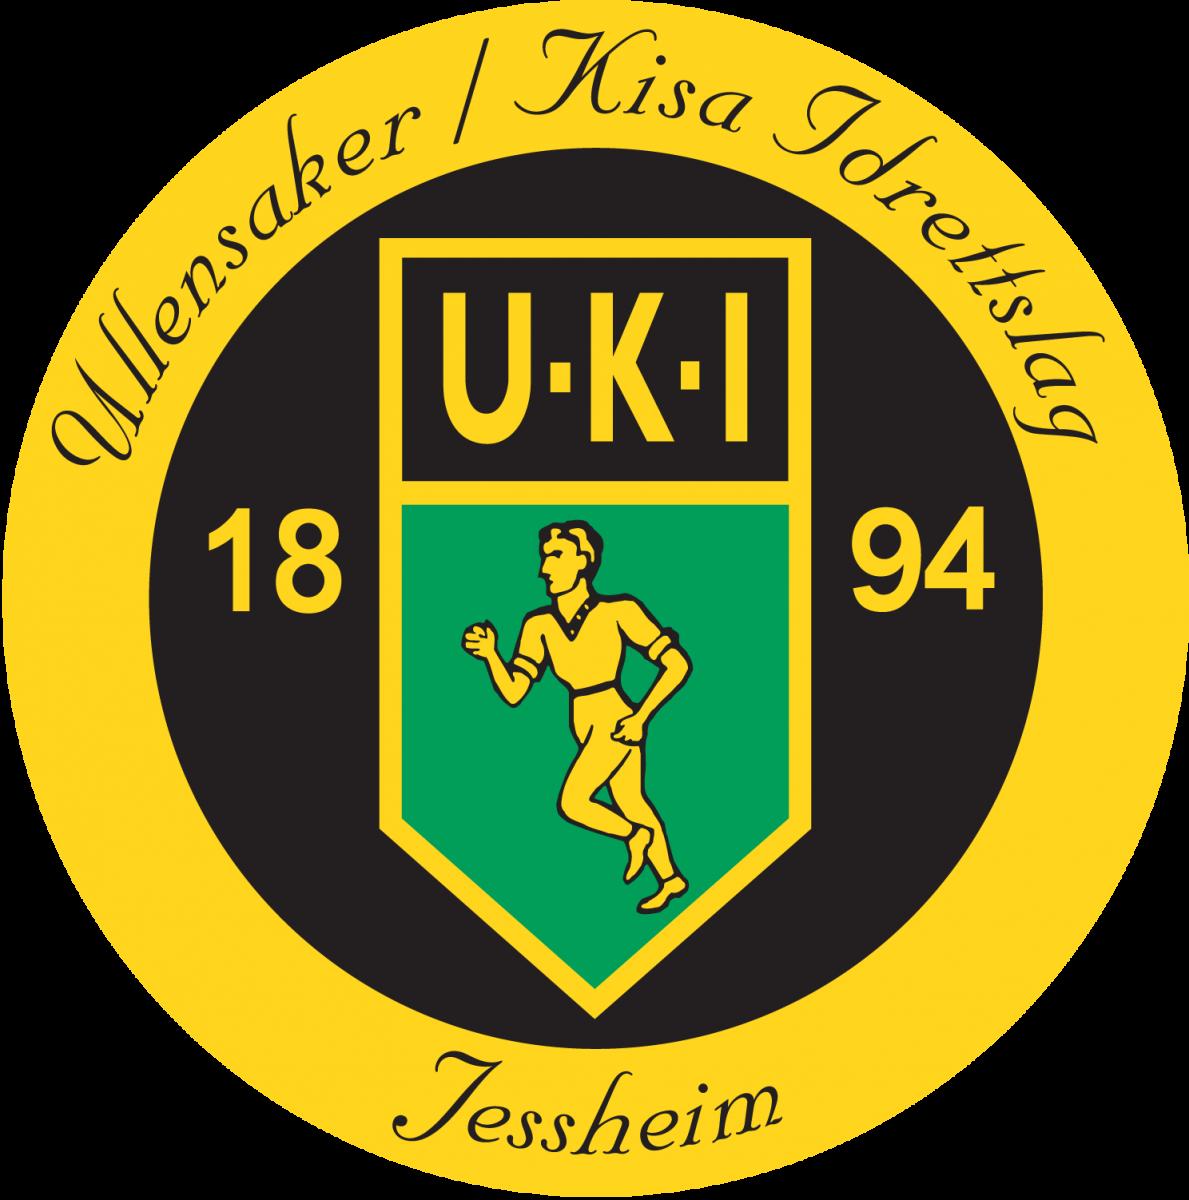 Ull Kisa logo png